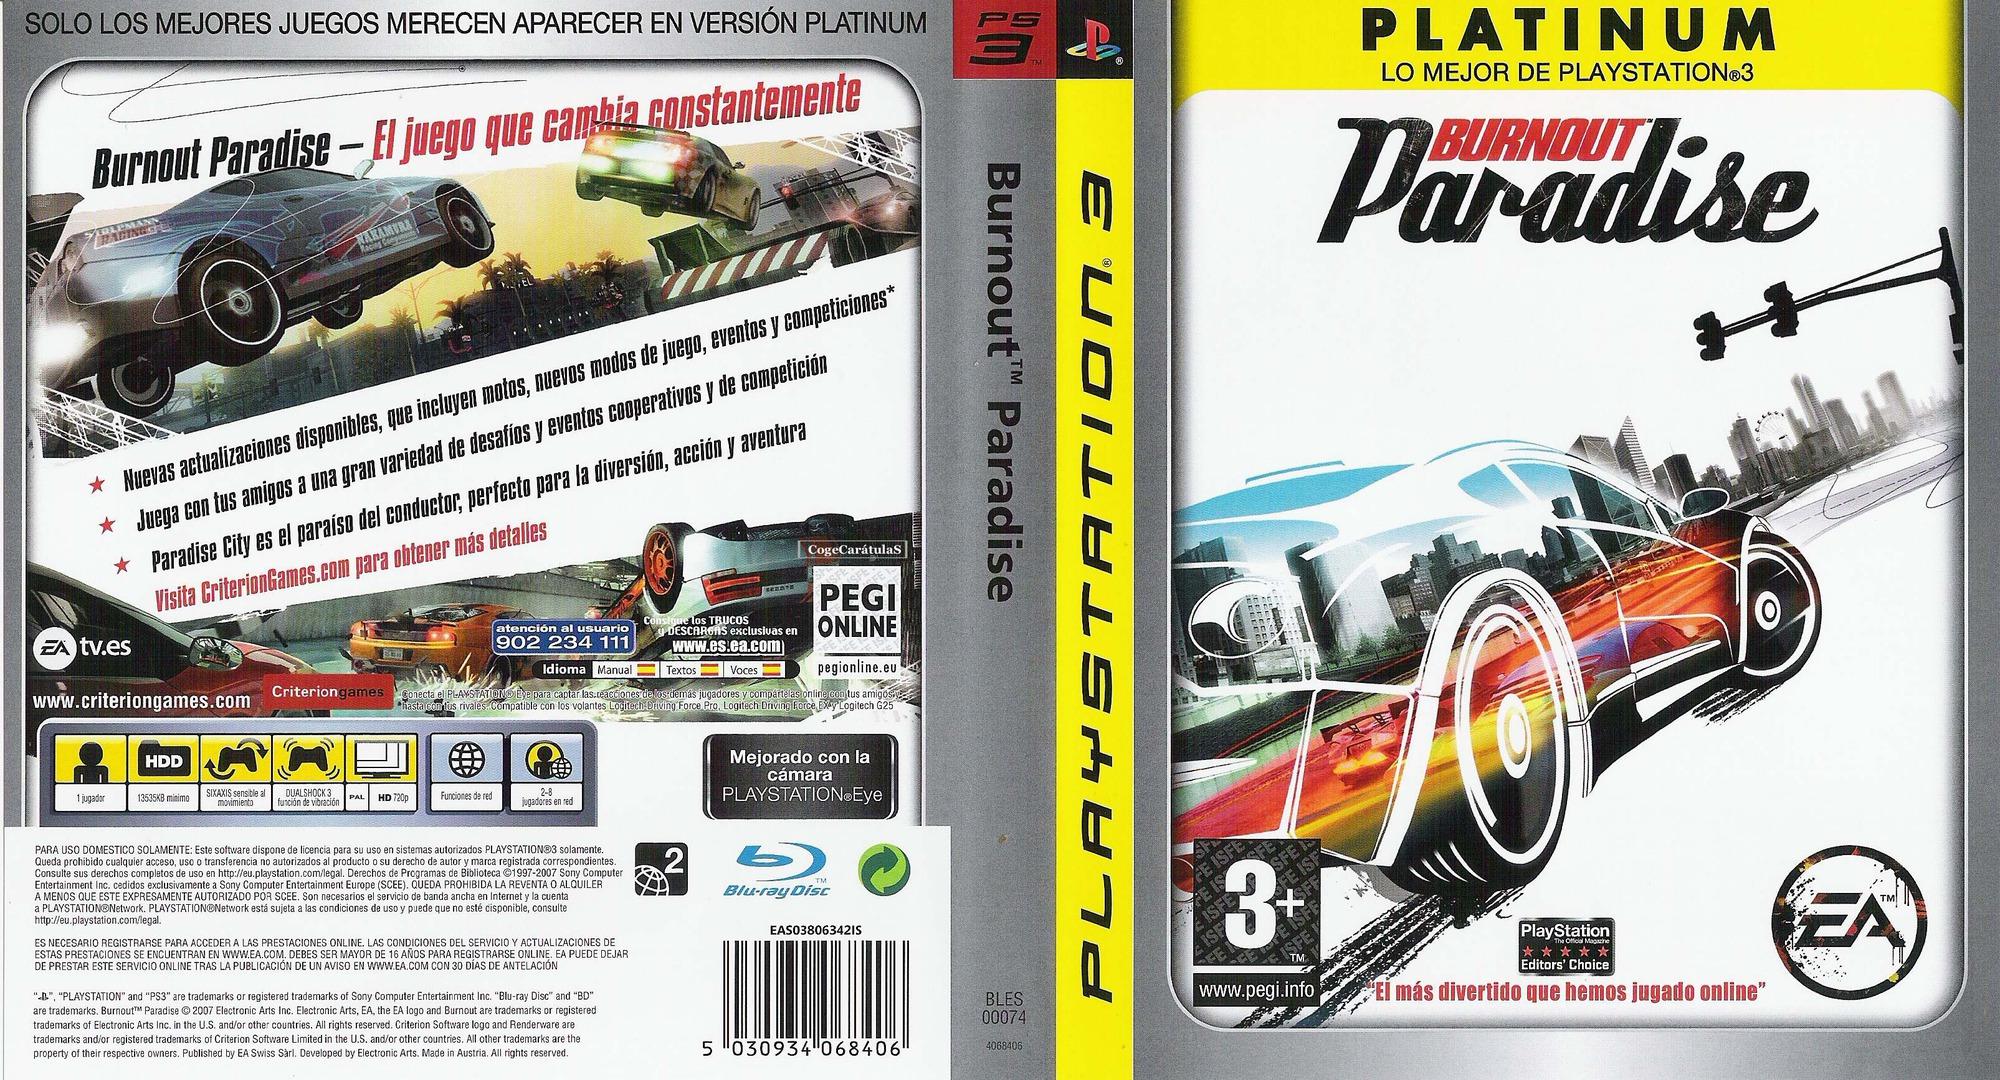 PS3 coverfullHQB (BLES00074)